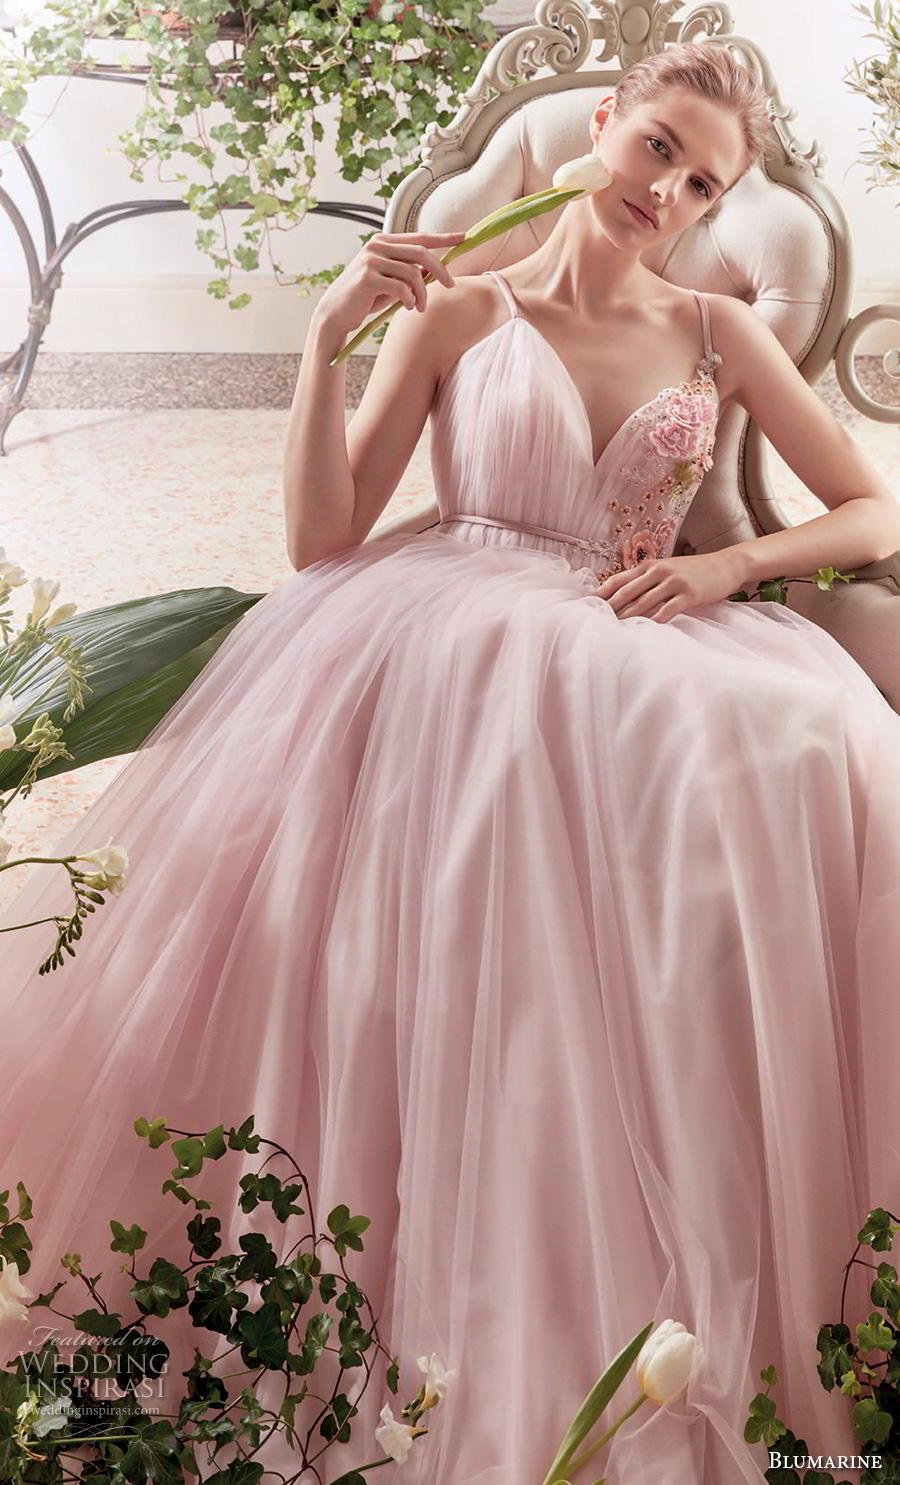 blumarine sposa 2019 bridal sleeveless thin strap sweetheart neckline ruched bodice tulle skirt romantic pink a  linw wedding dress open v back medium train (1) zv